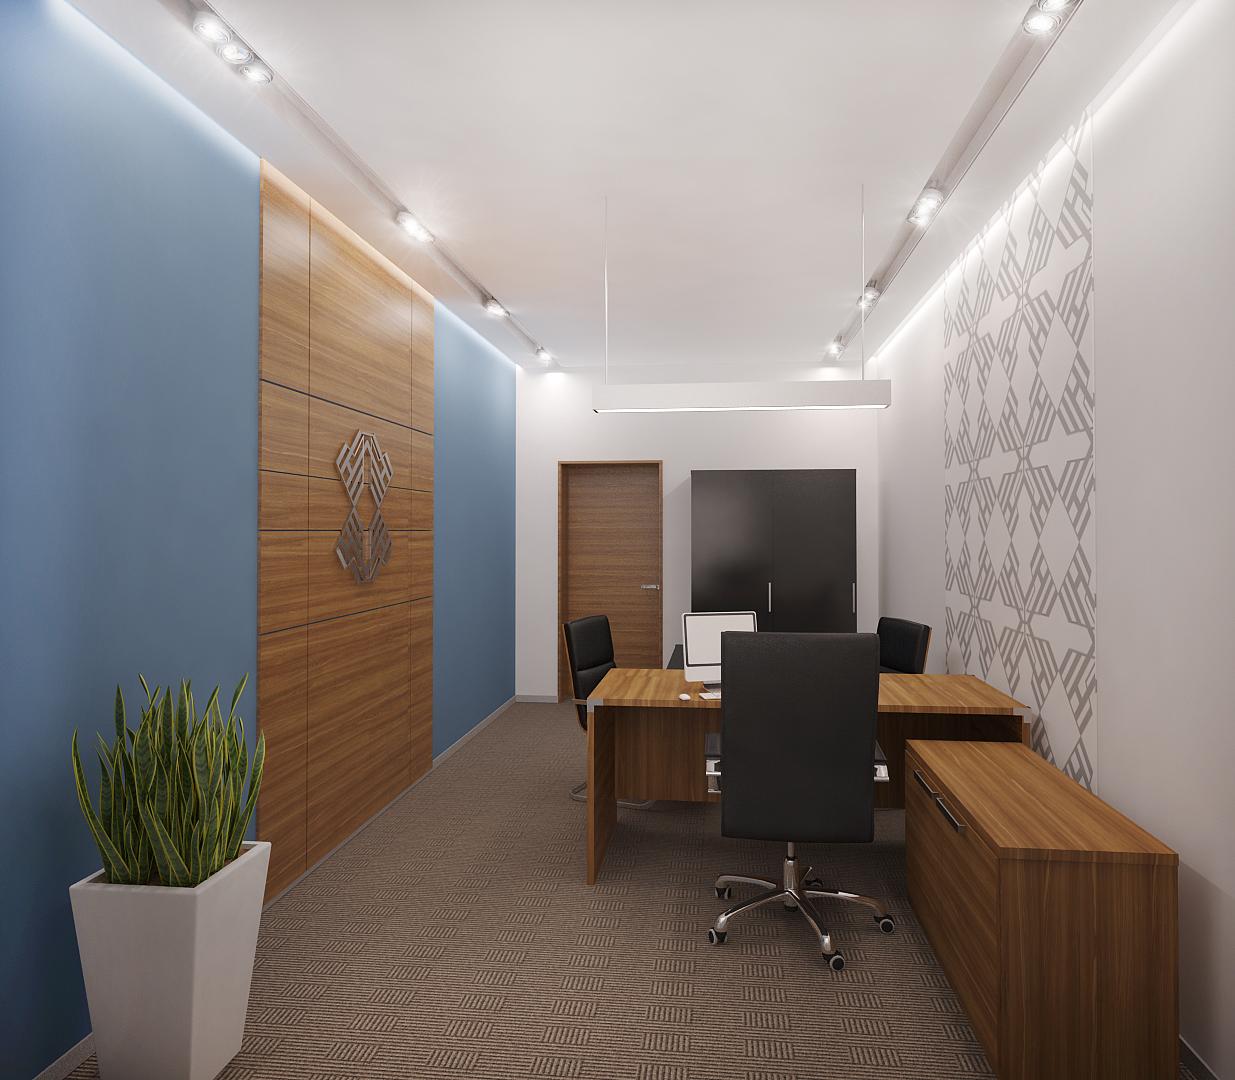 проект перепланировки офиса